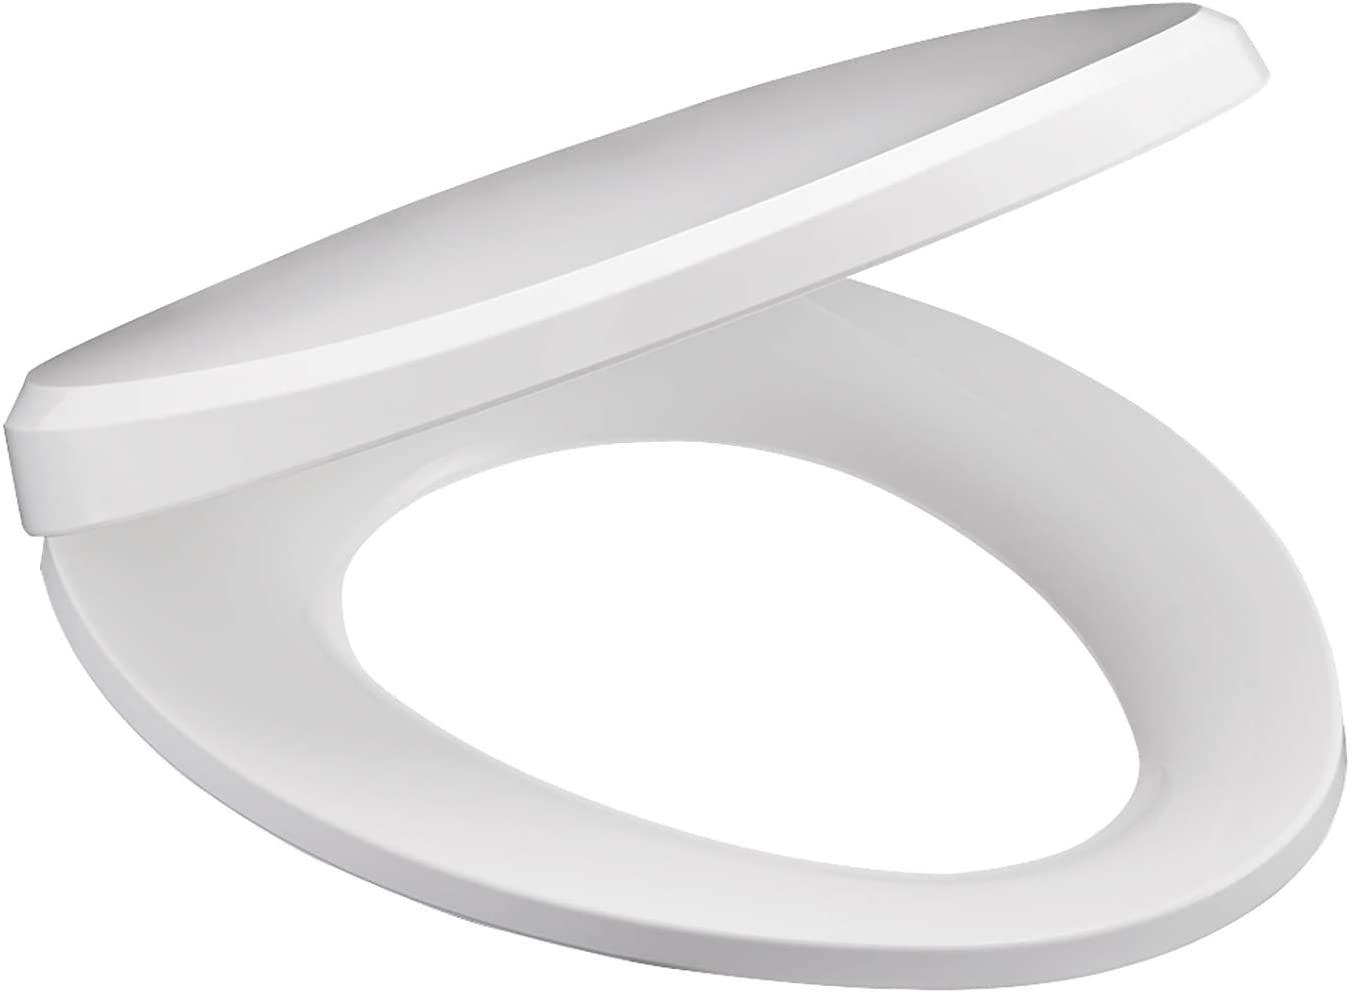 SANEI 期間限定送料無料 普通便座 前丸便座 選択 ソフト閉止 PW9032-W 簡単取付 ホワイト 取り外しワンタッチ